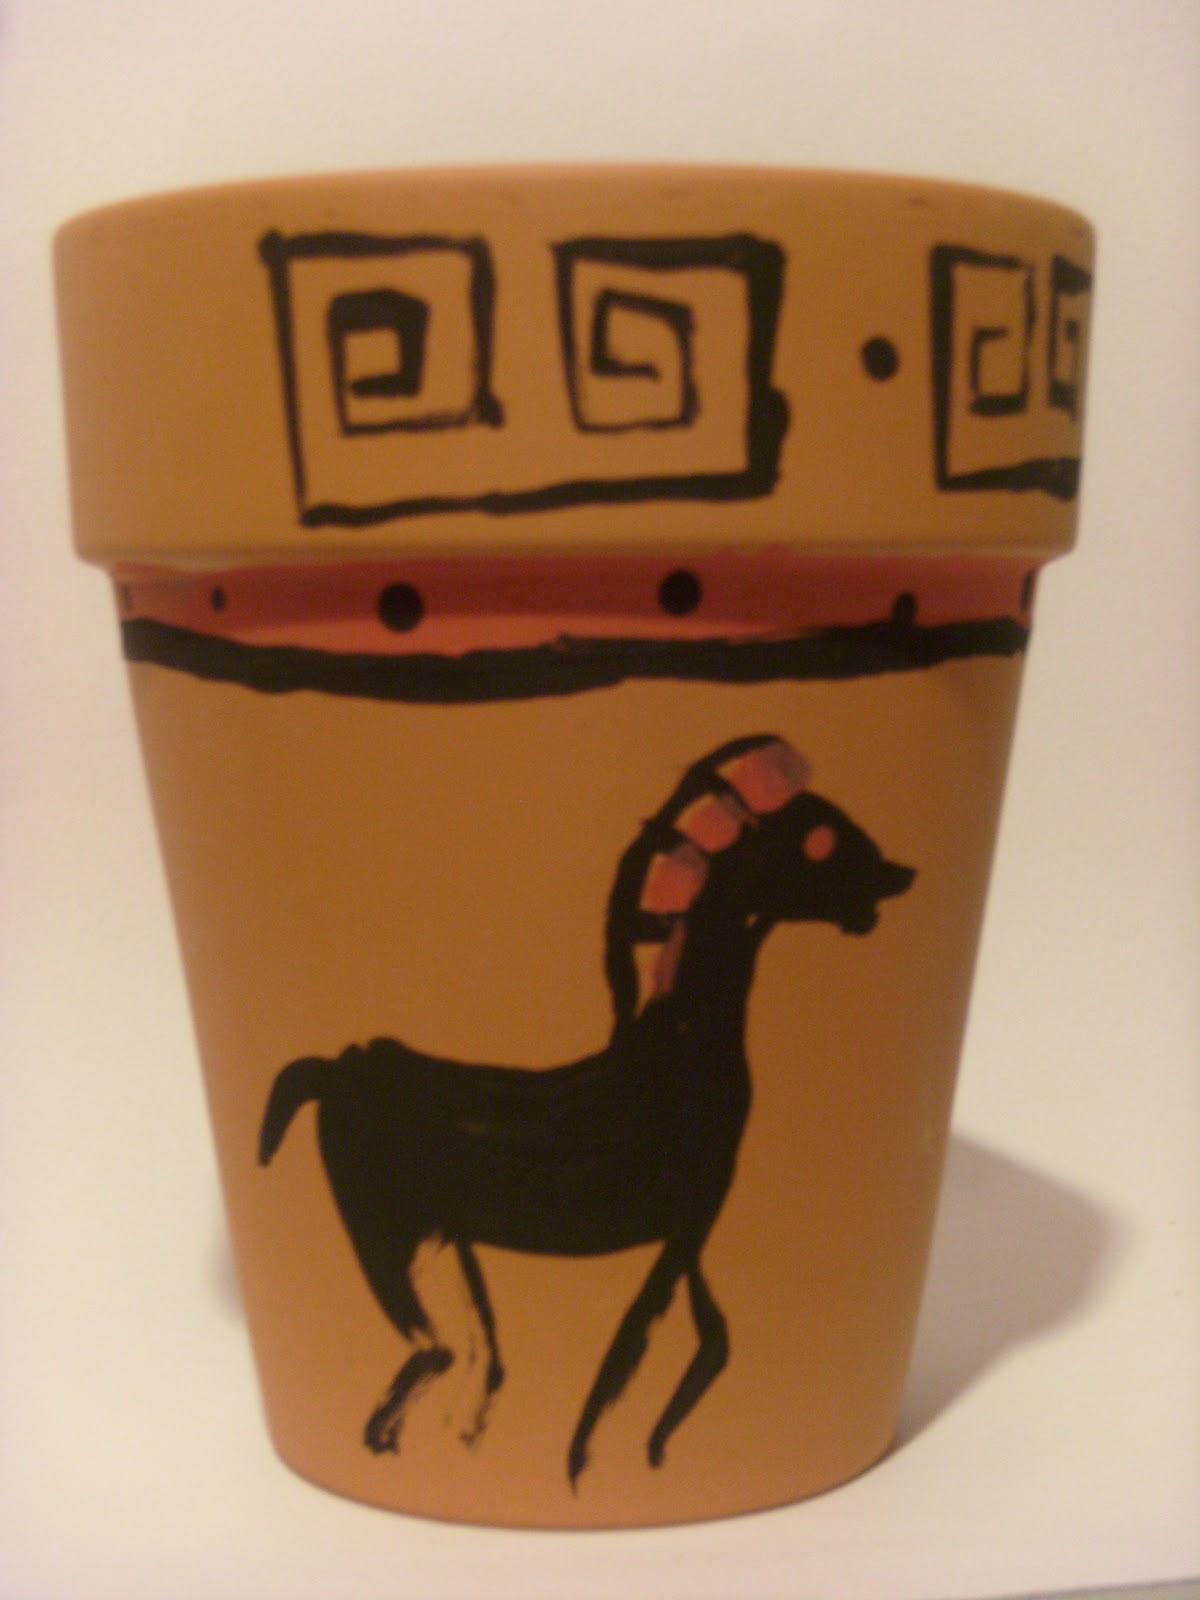 Picassos basement my big fat greek vase my sample vase reviewsmspy